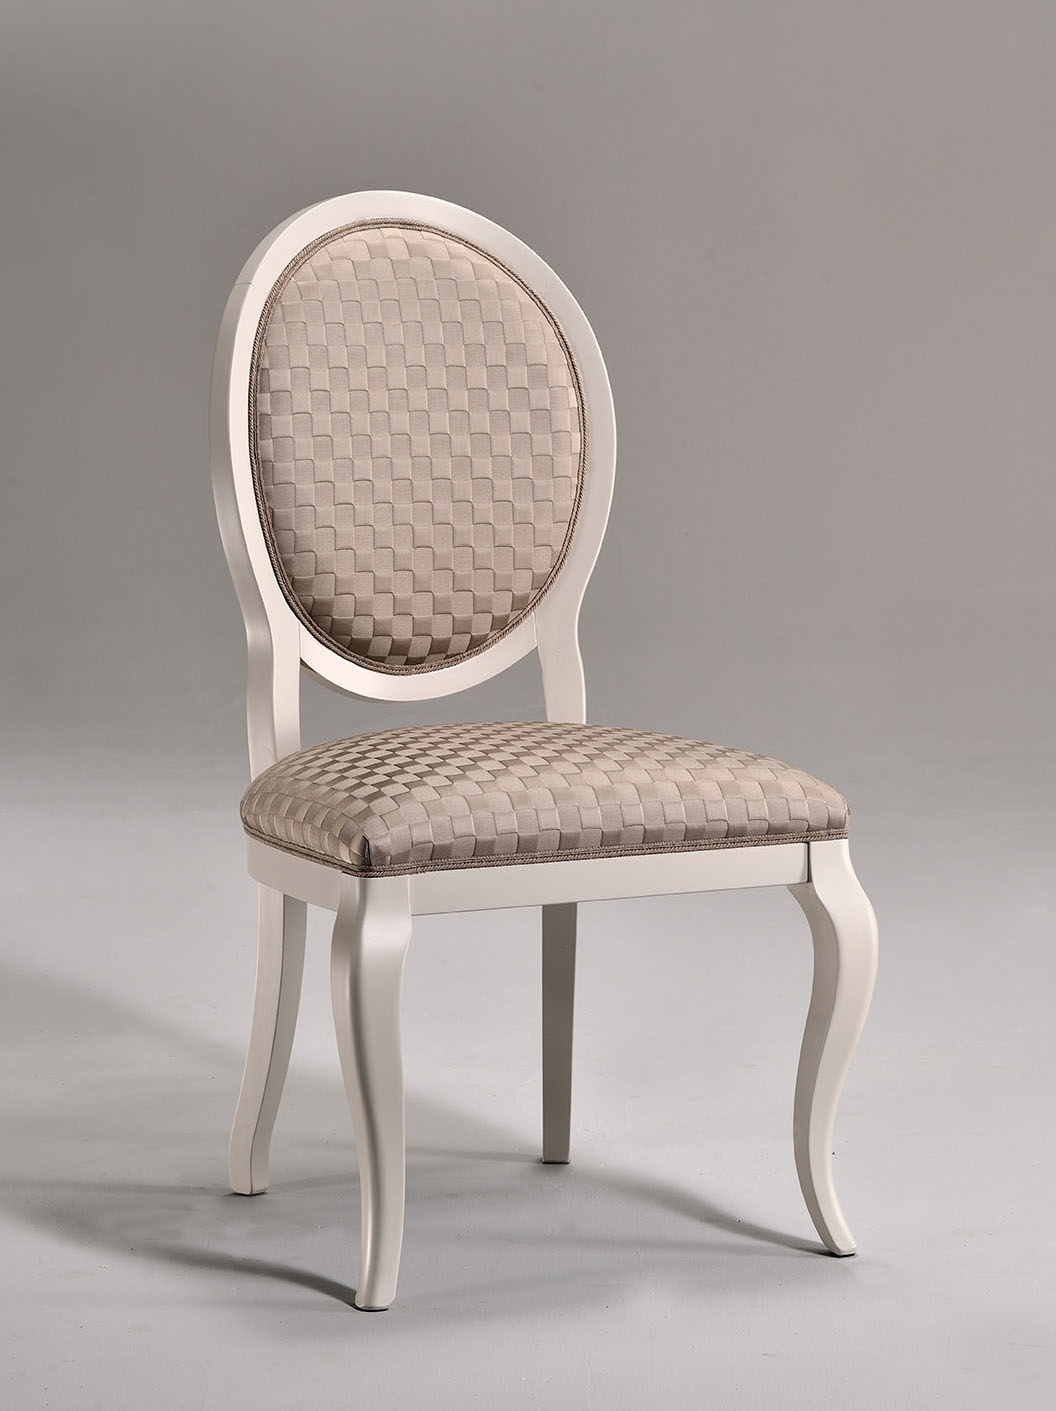 Cena de la silla, asiento tapizado, para sala de estar | IDFdesign